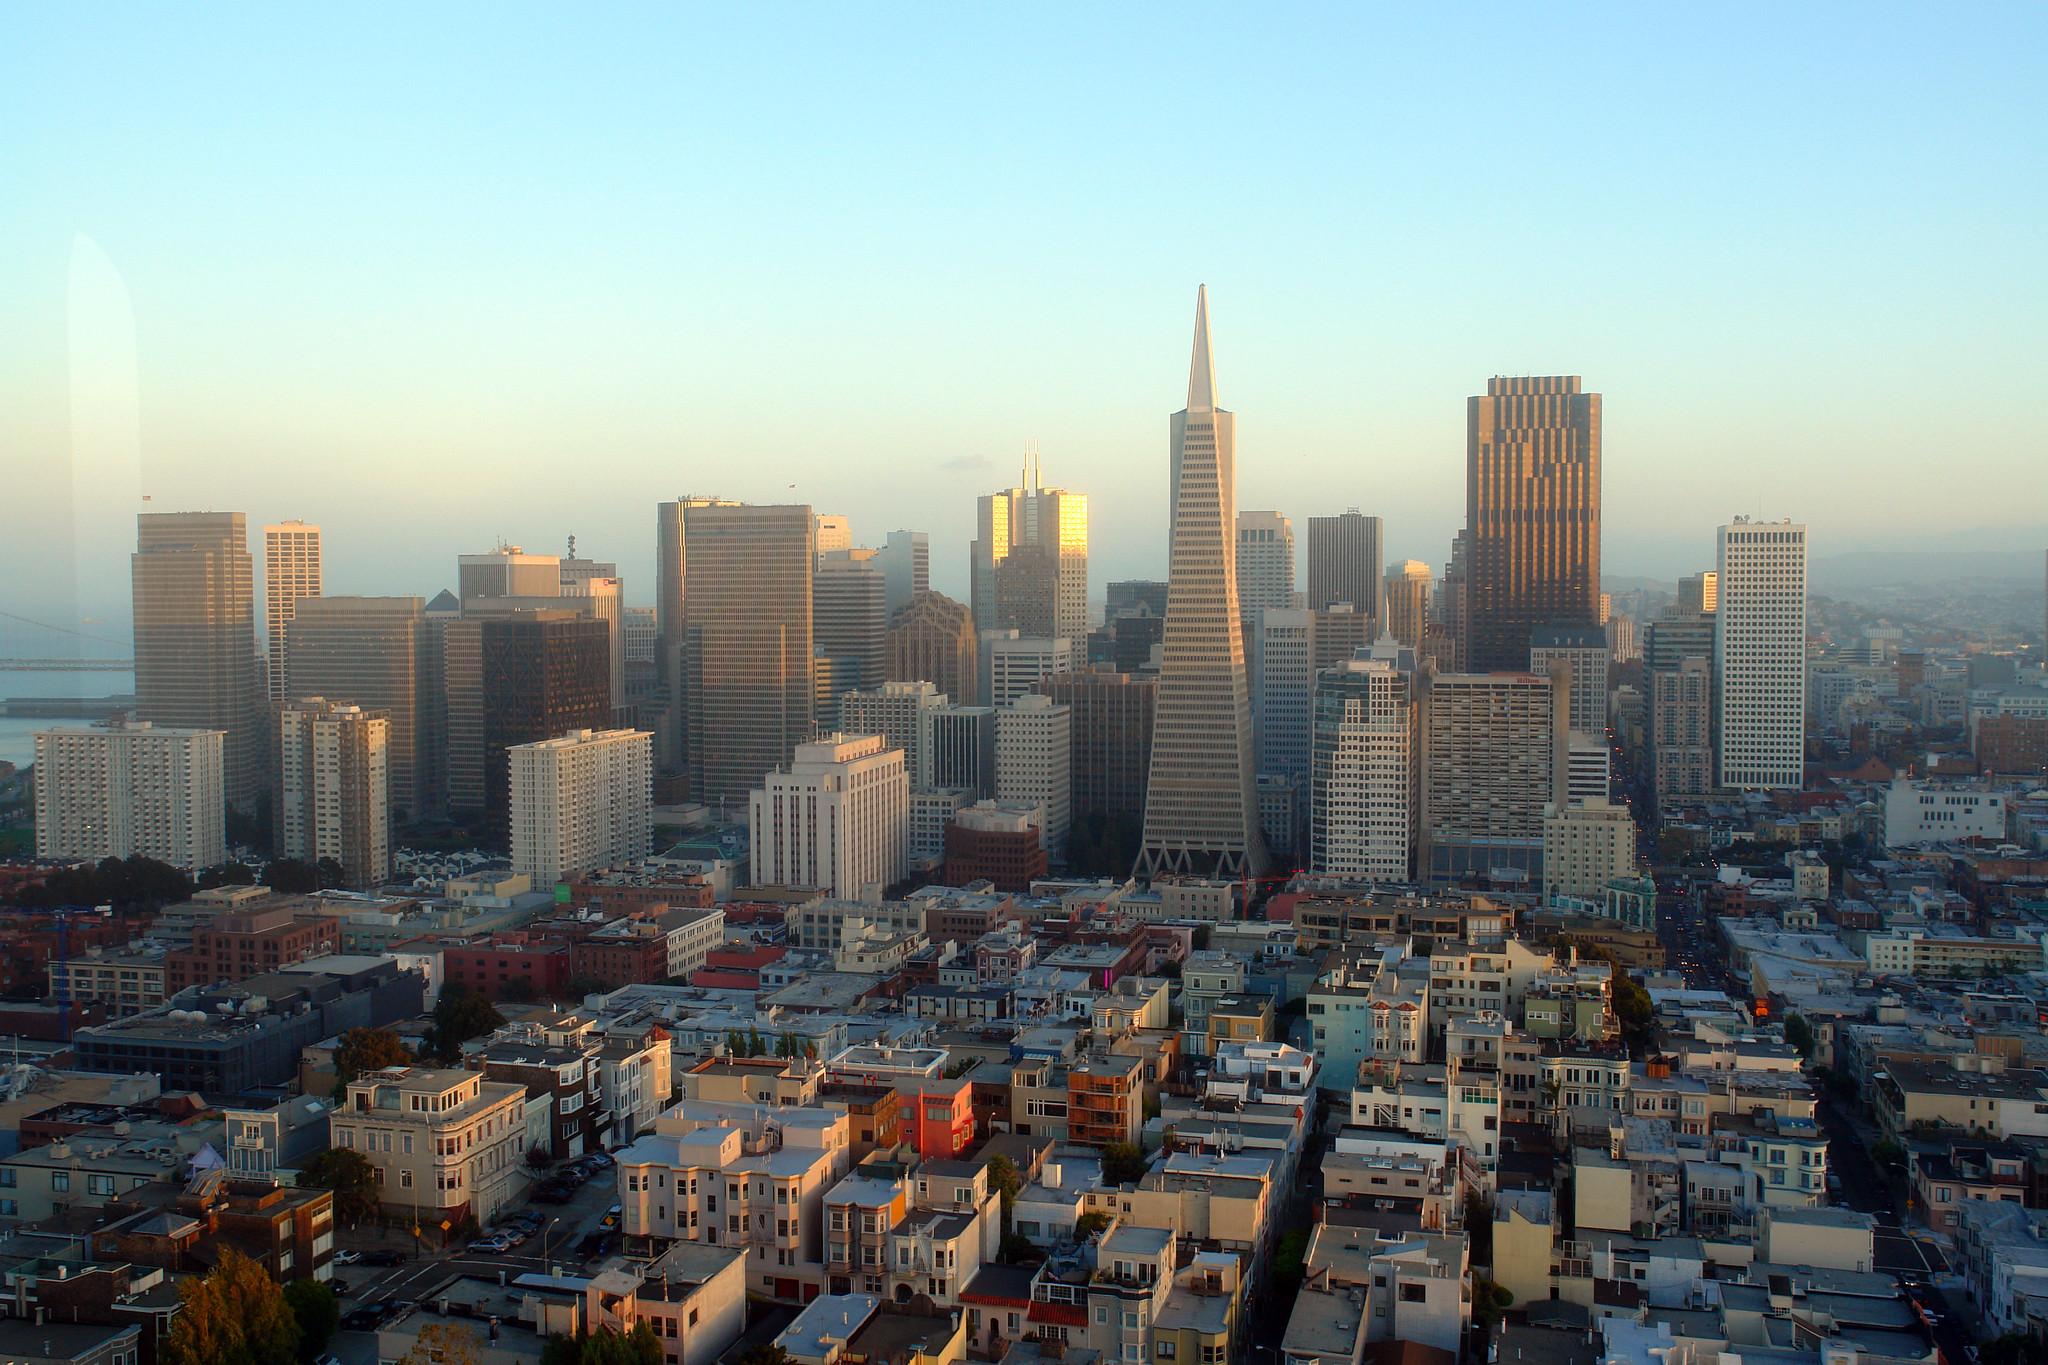 Que ver en San Francisco, California que ver en san francisco - 40176713354 04b83f704f k - 10 lugares mágicos que ver en San Francisco, California